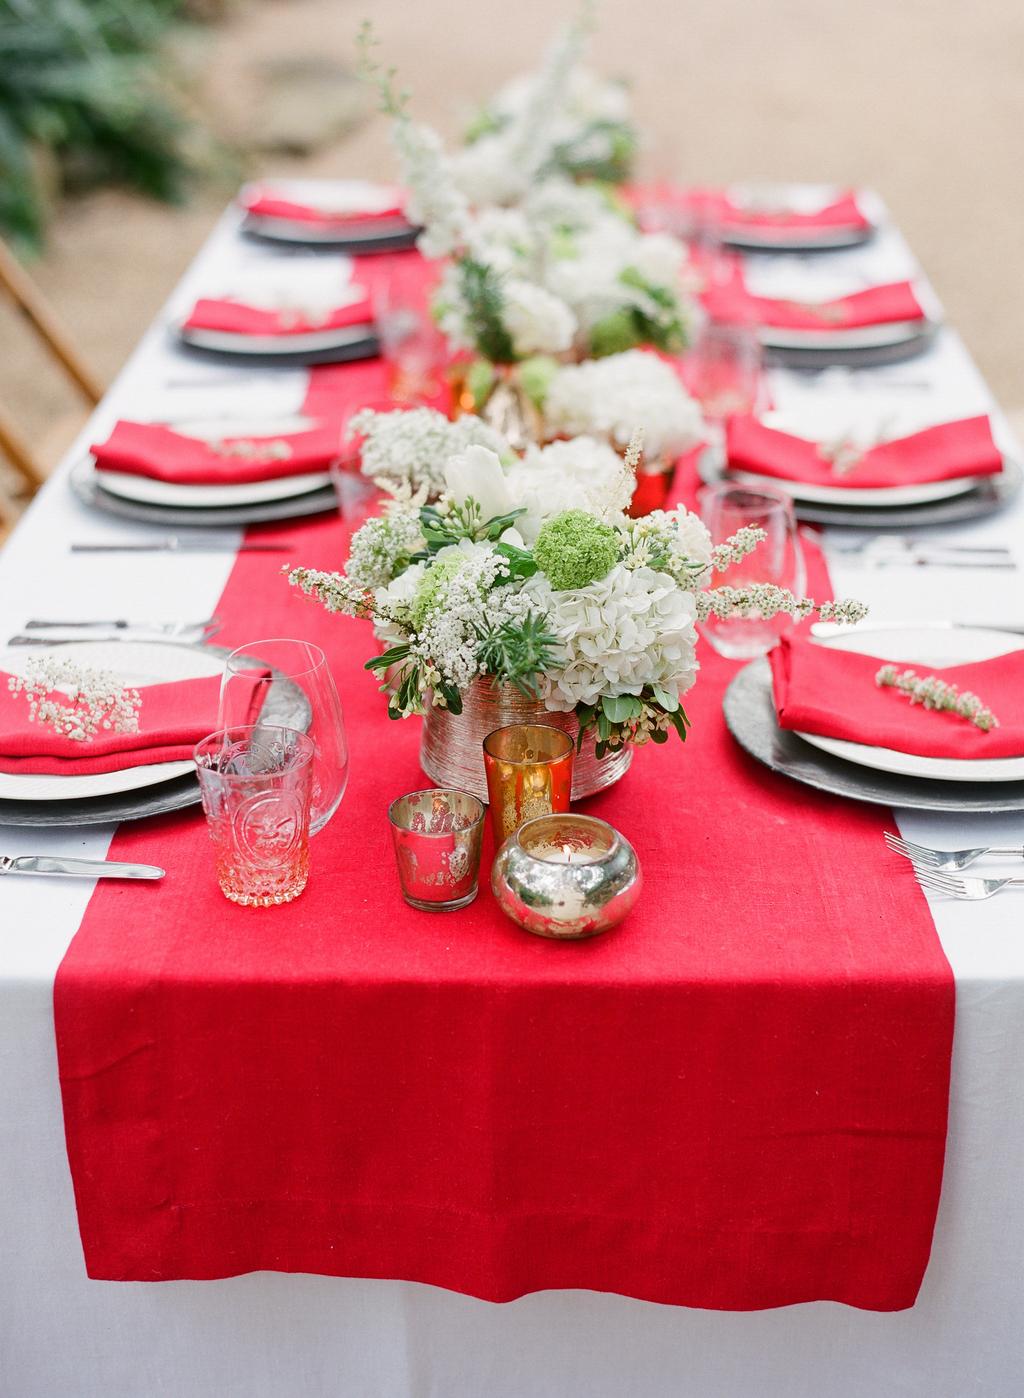 Styled-wedding-santa-barbara-chic-beaux-arts-photographie-italian-bohemian-wedding-venue-table-setting-red-white-flowers-antique-glass-012.full